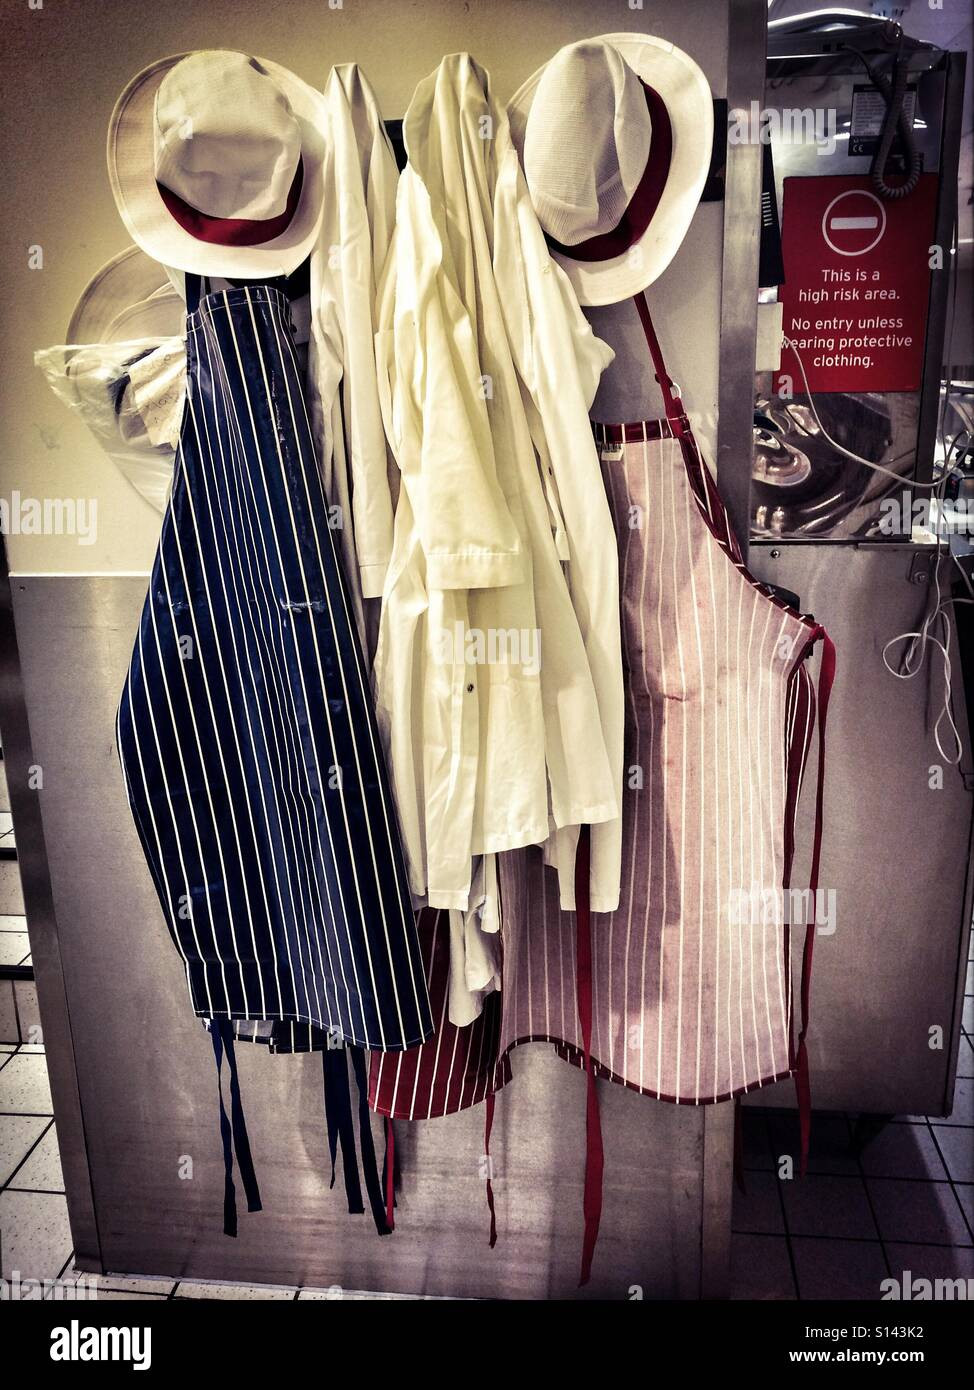 White apron sainsburys - Butcher S Aprons Hanging On A Peg In Sainsbury S Supermarket Stock Image